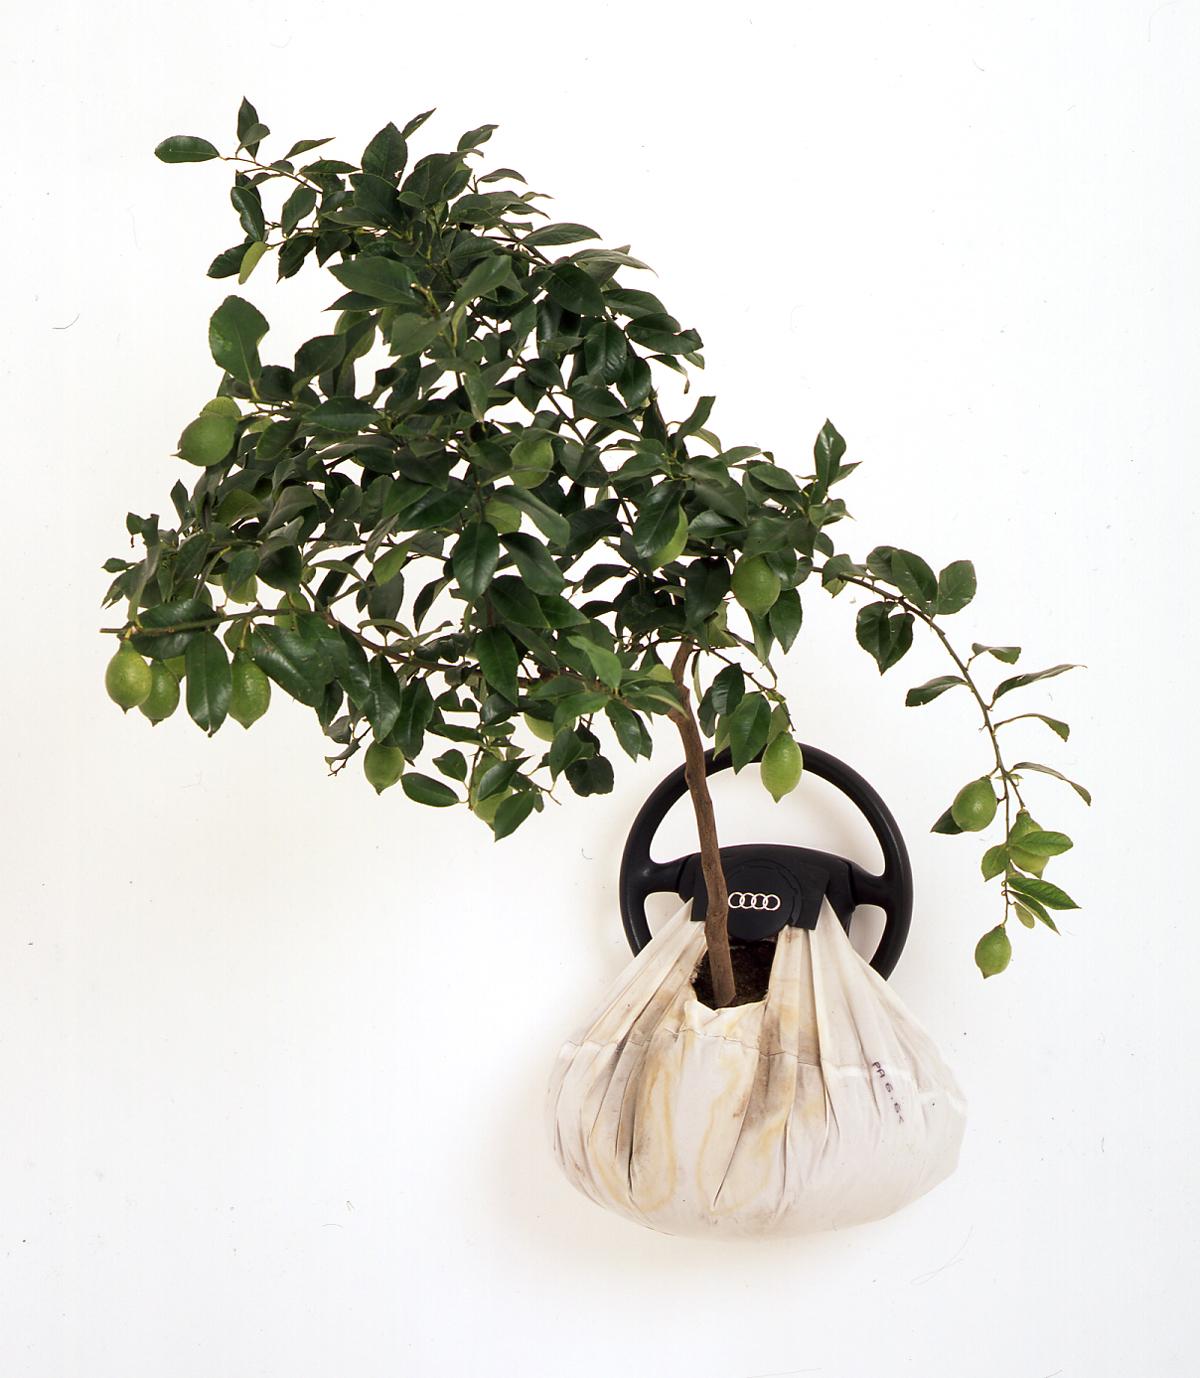 Airbag-Growbag, 2005, airbag, lemon tree